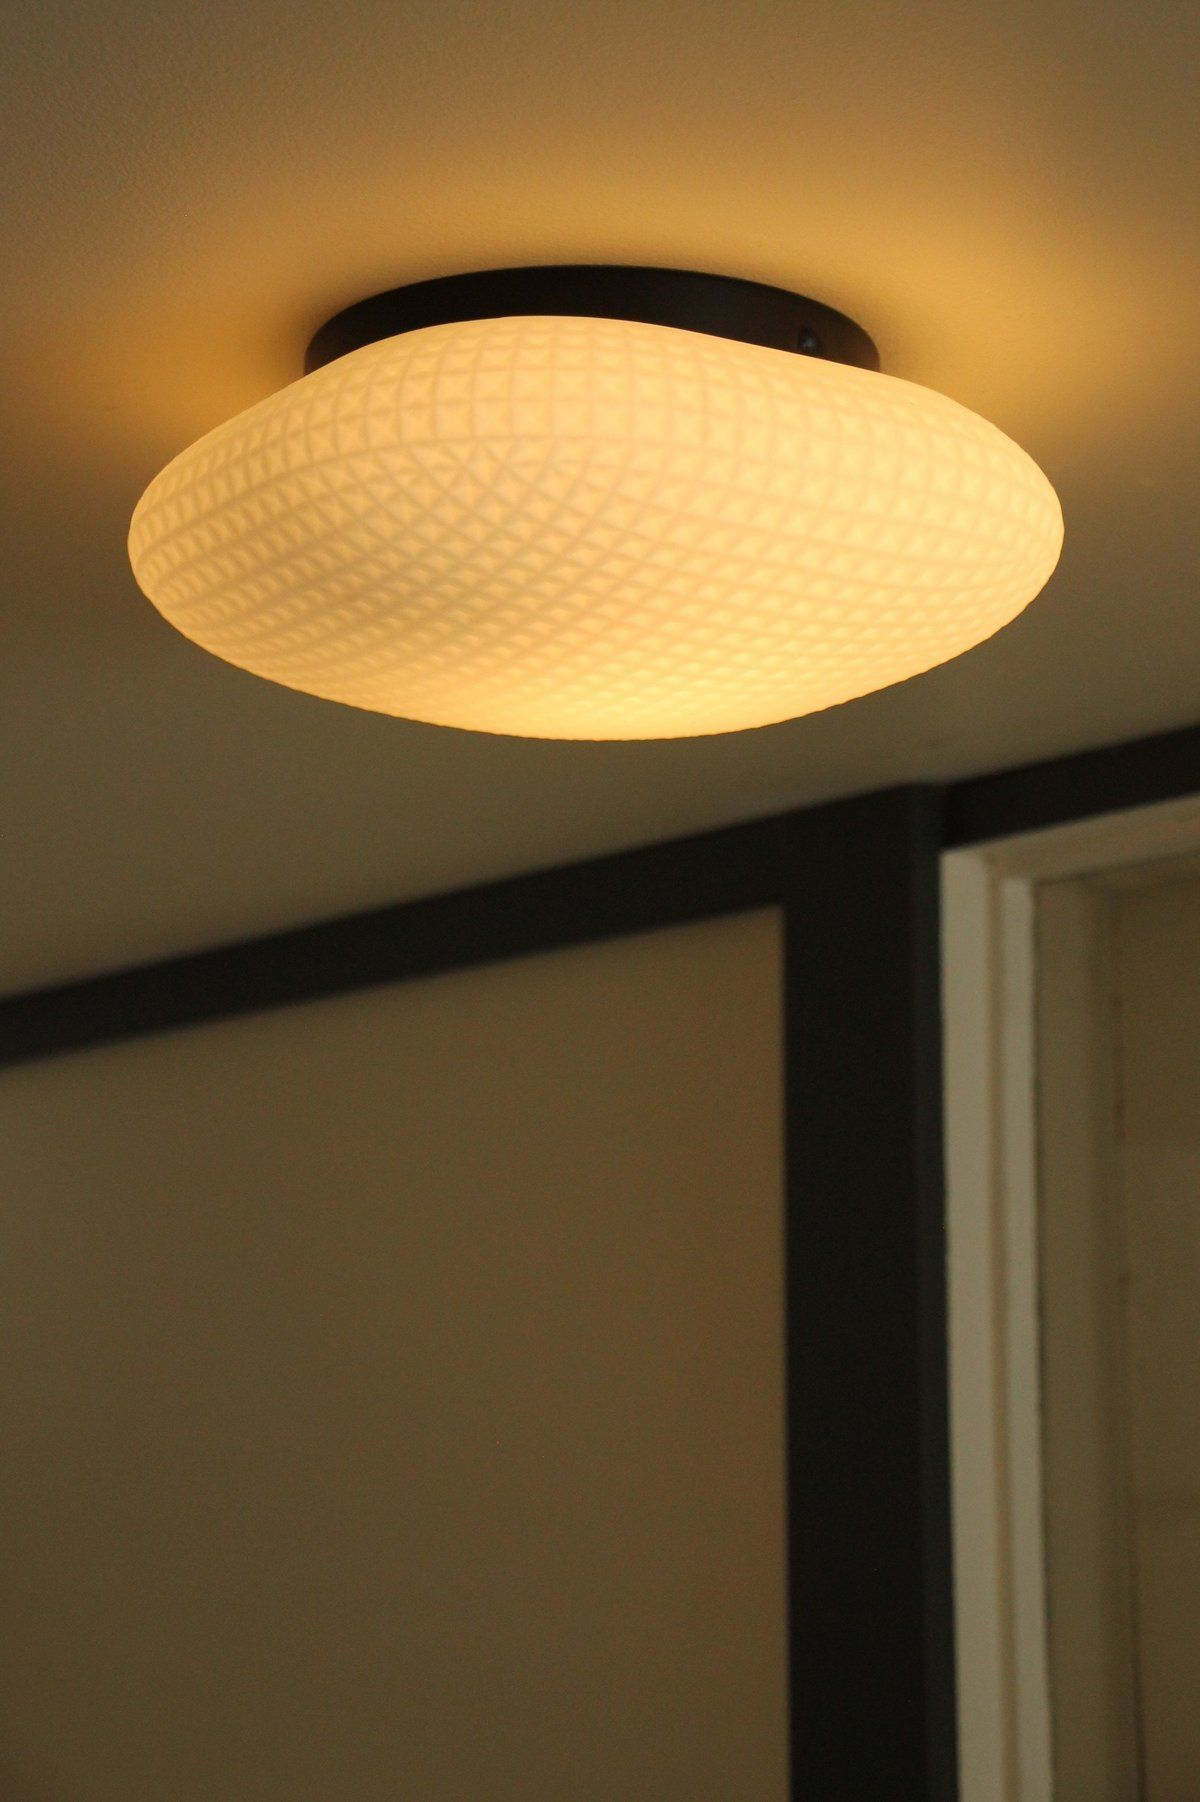 Burlington Ceiling Light In 2020 Ceiling Lights Ceiling